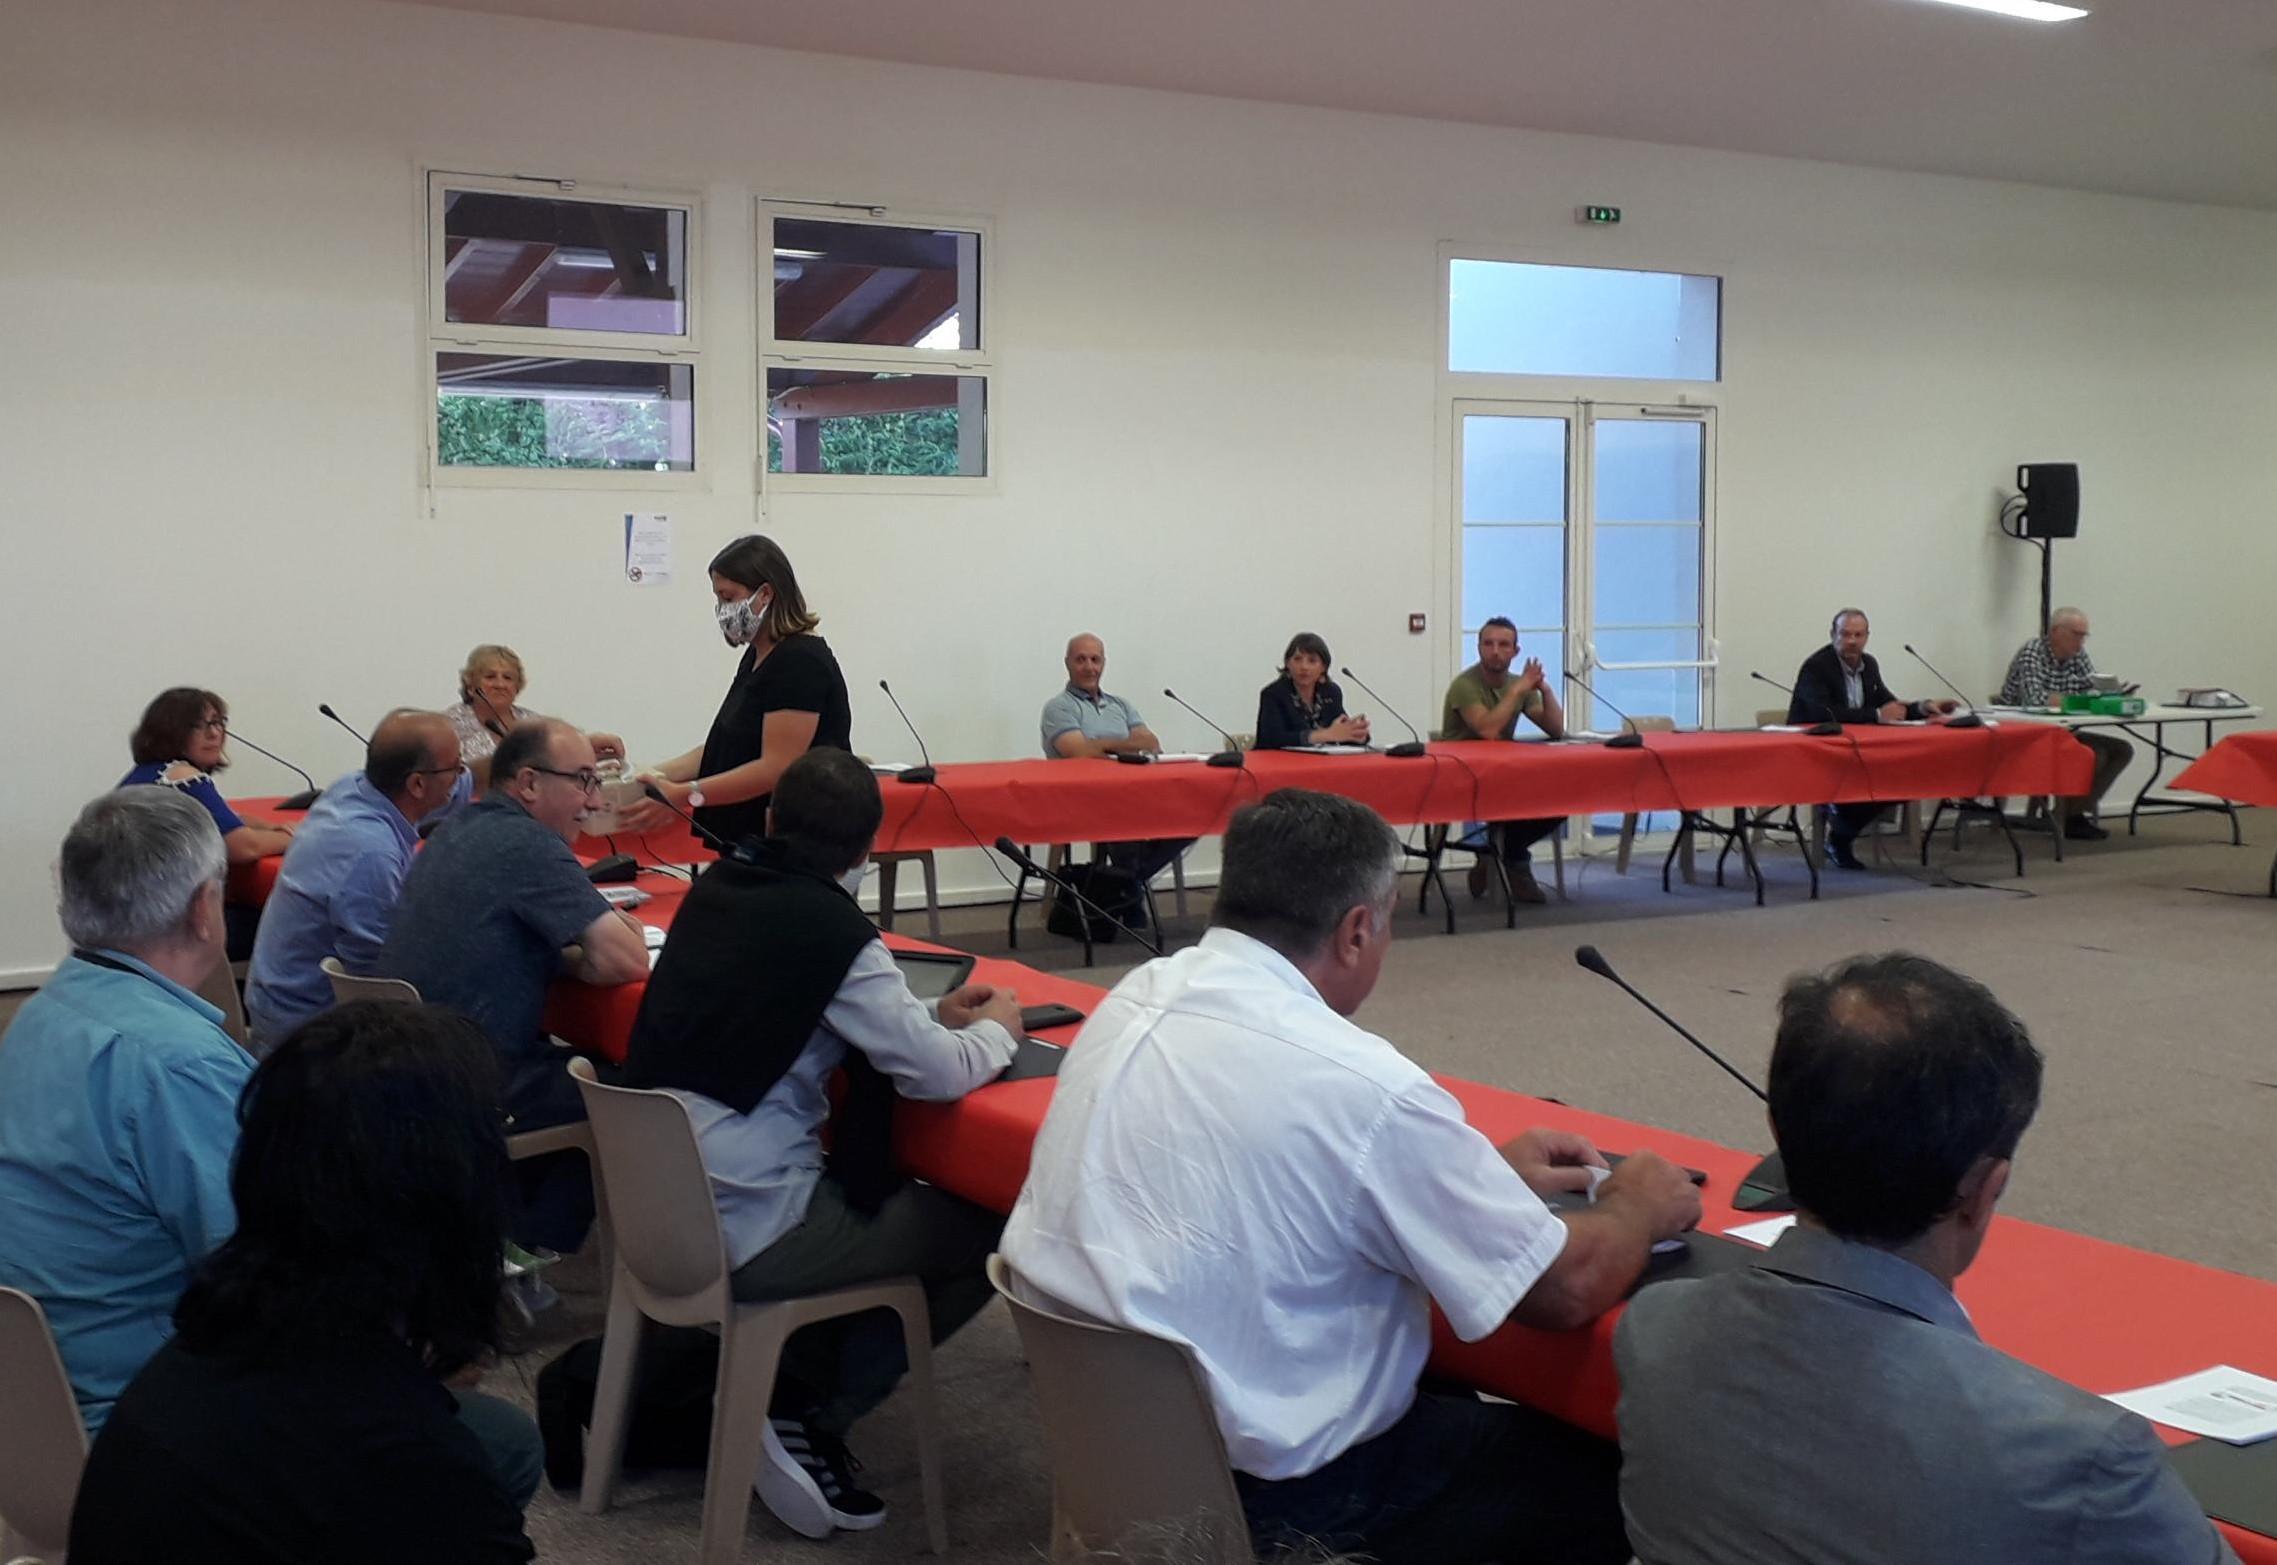 Conseil municipal: Intervention de Bruno CENDRES